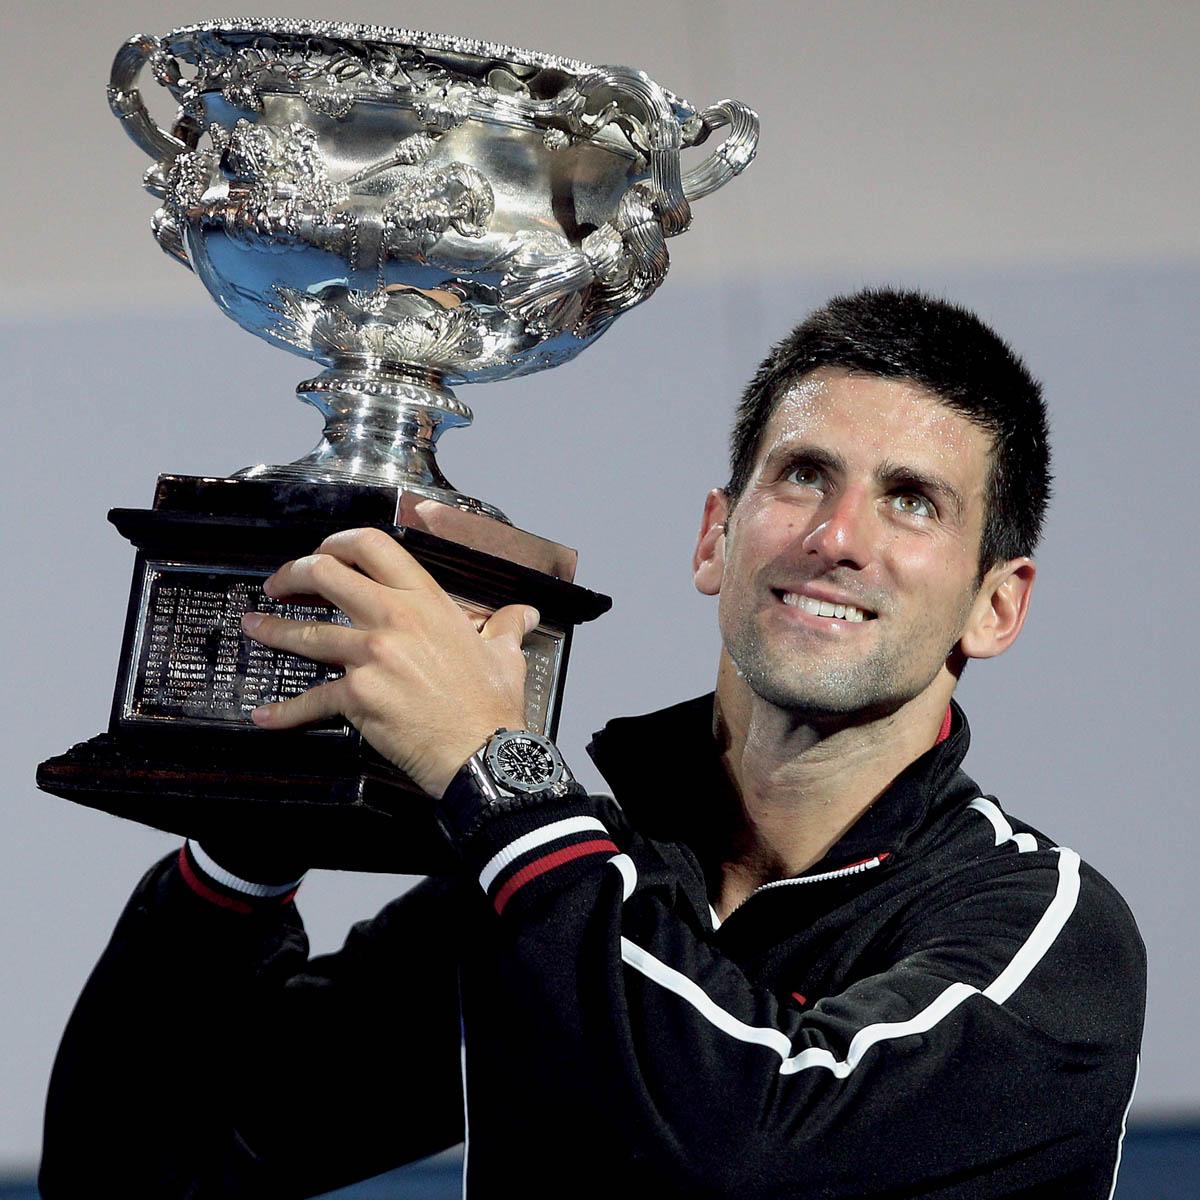 The Watch Quote Photo Novak Djokovic Audemars Piguet Ambassador Wins A Third Consecutive Grand Slam